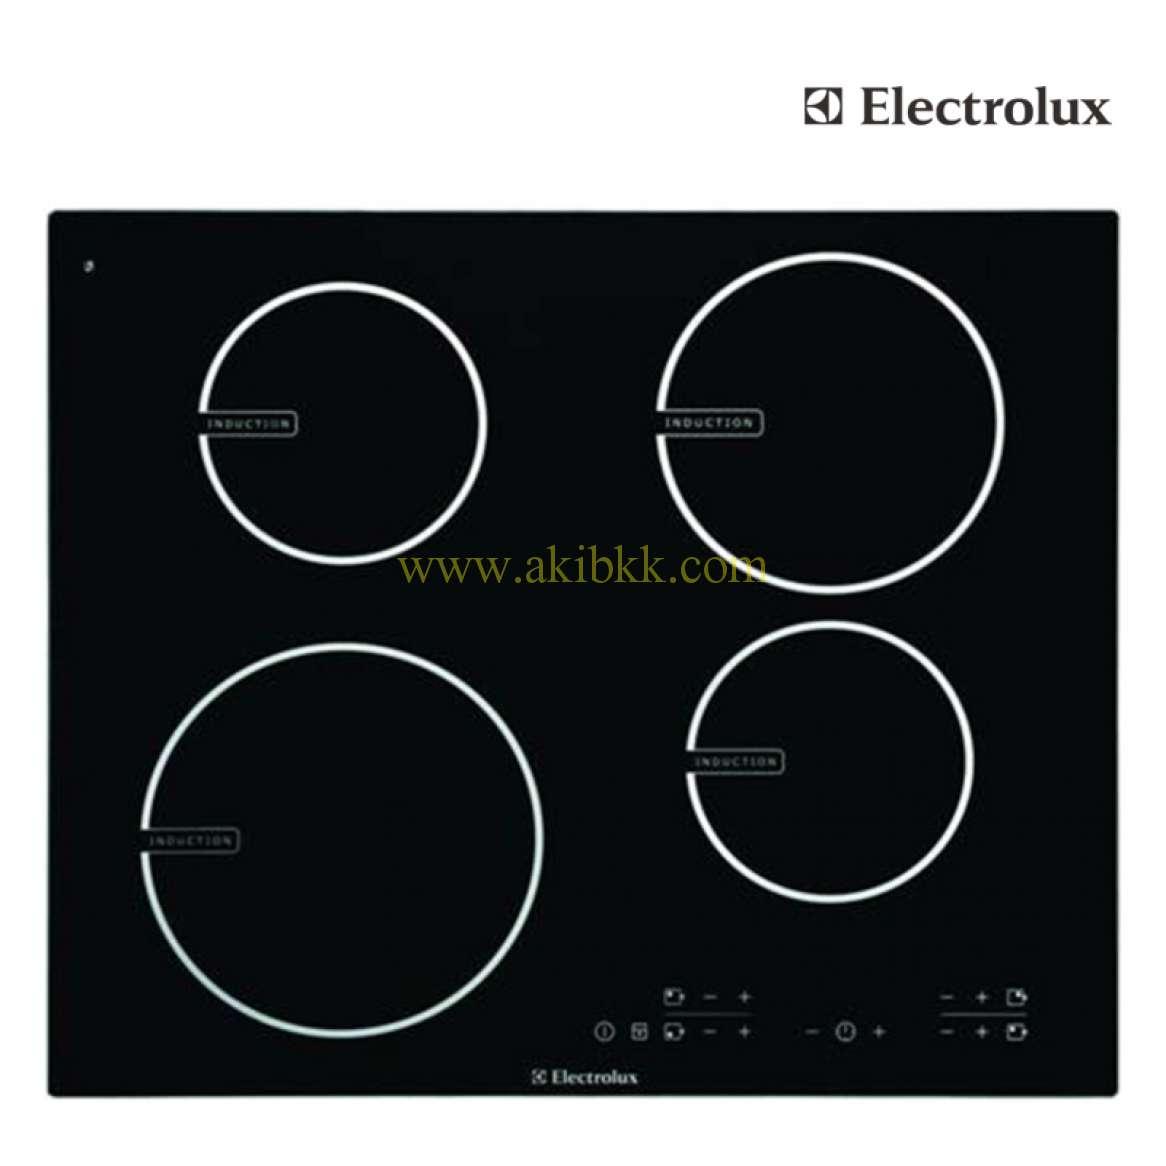 EHED63CS เตาฝัง INDUCTION 4 หัวเตา 60cm